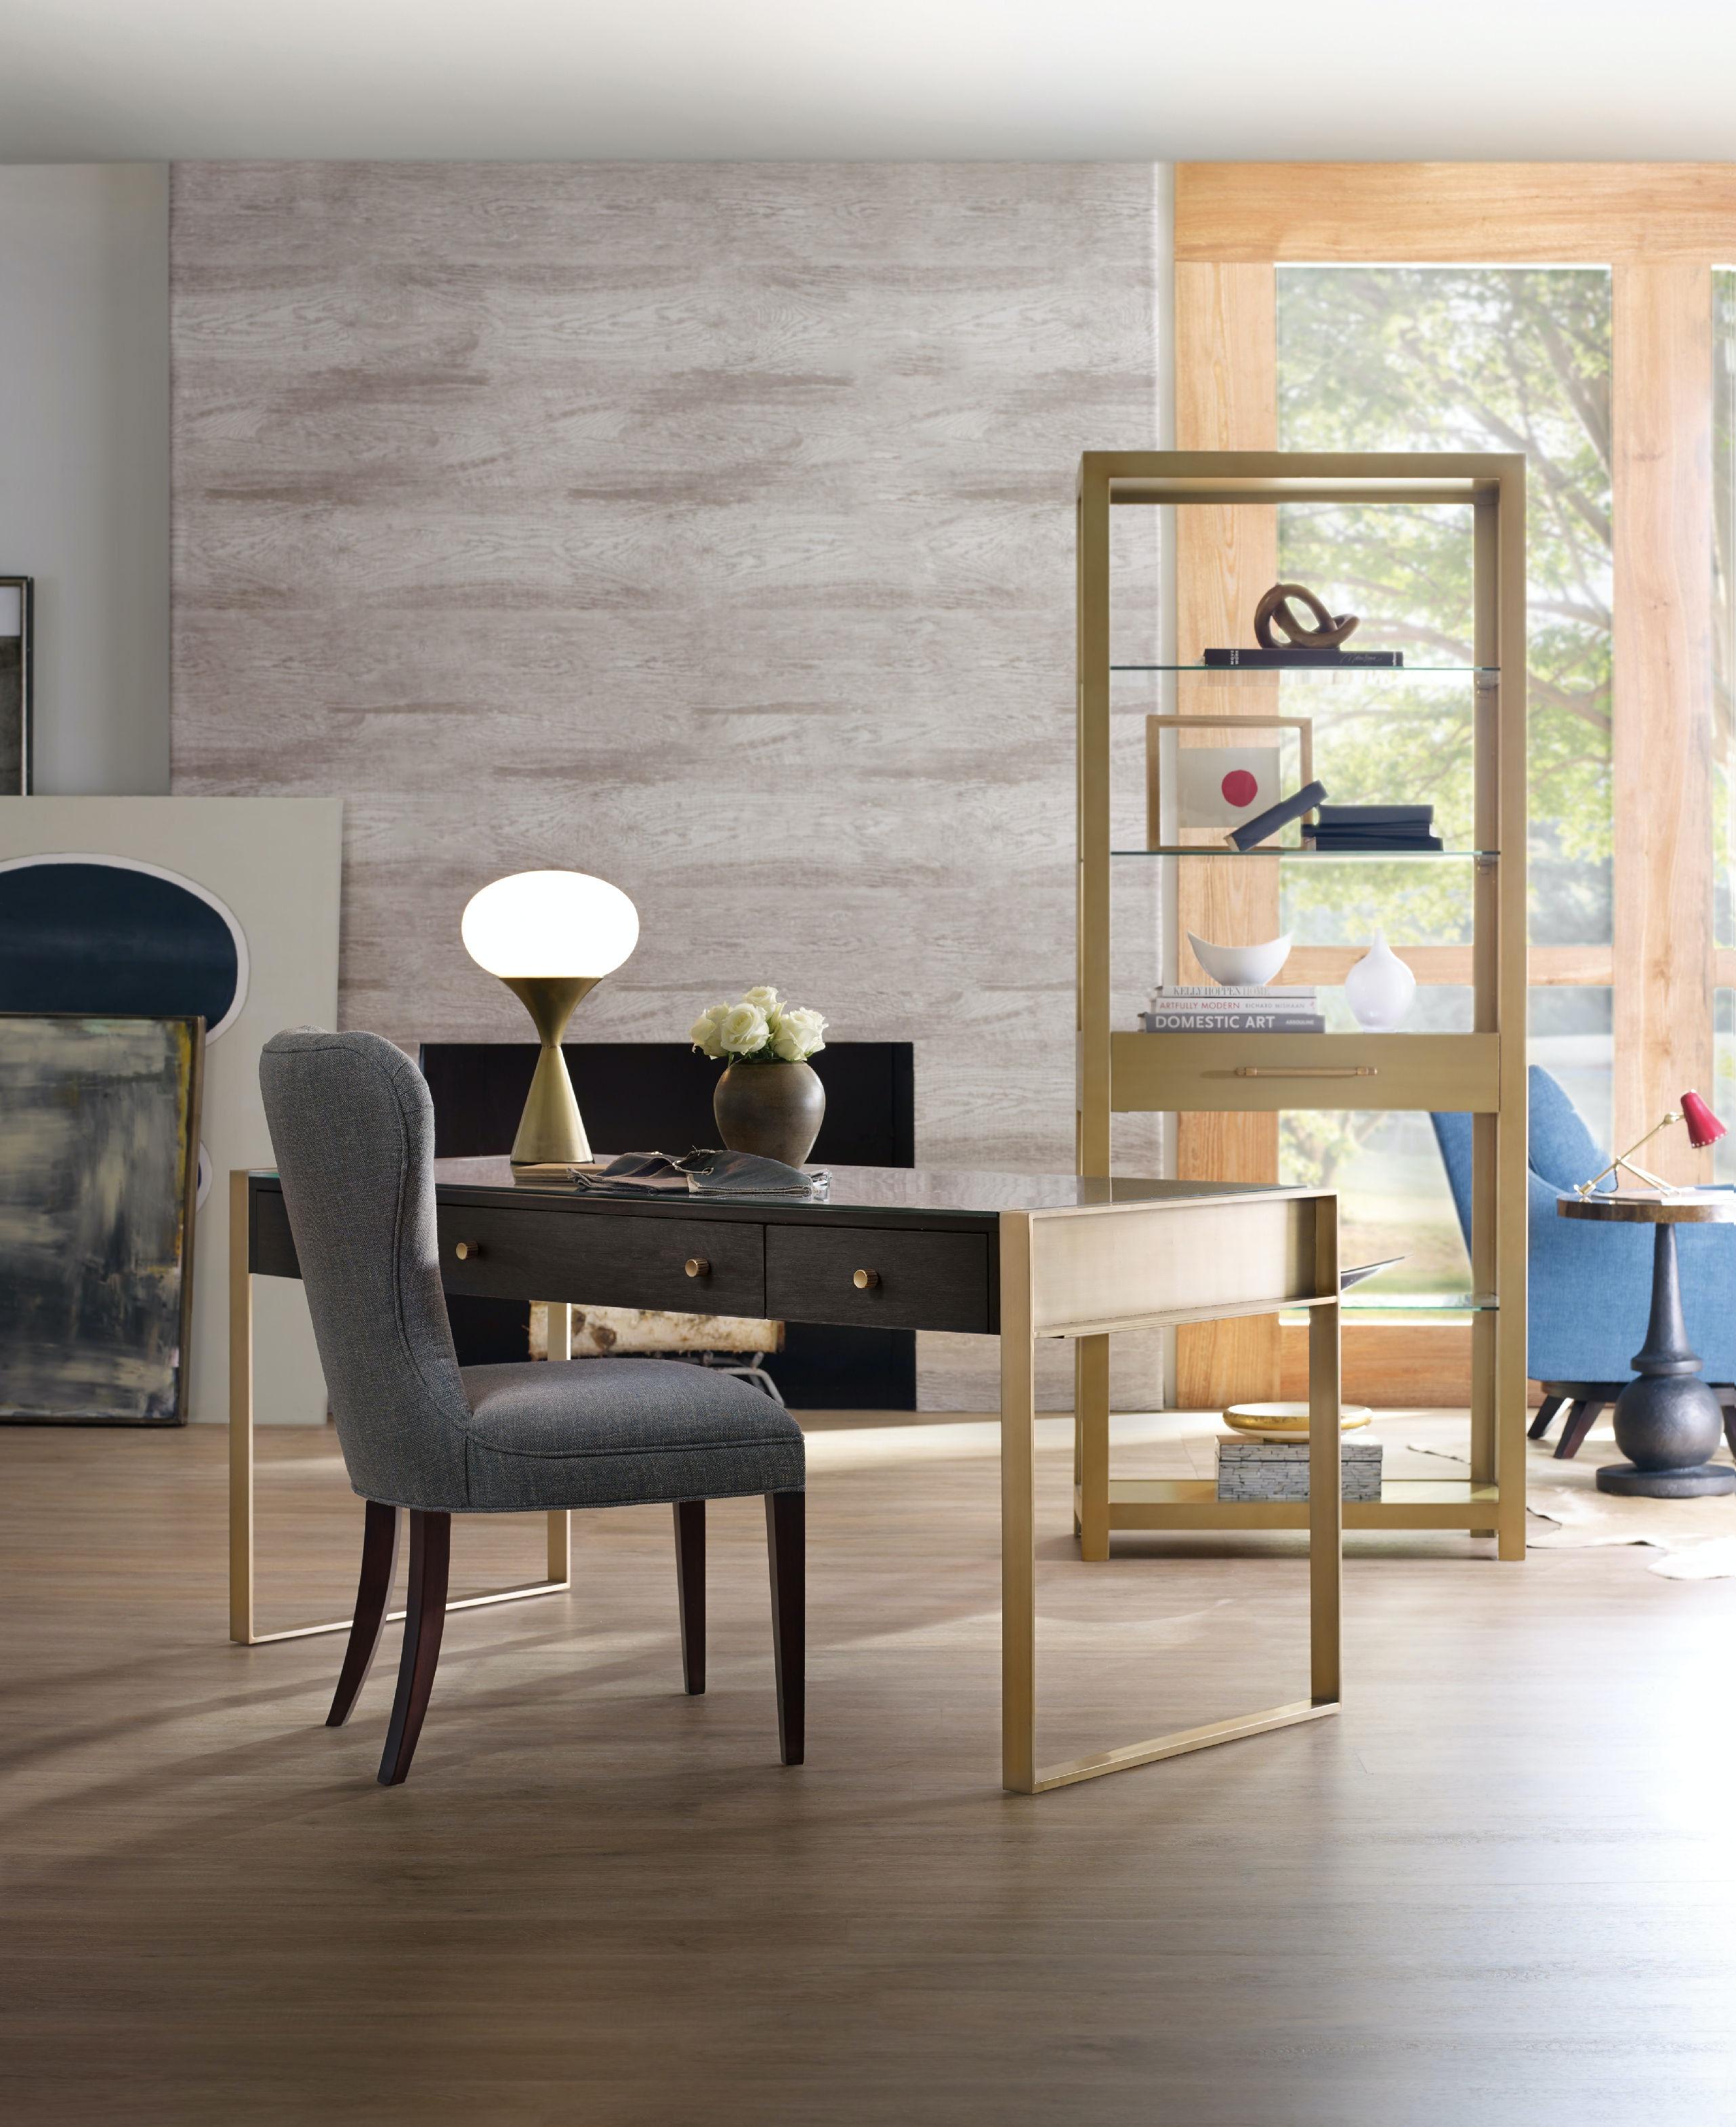 Hooker Furniture Curata Writing Desk 1600 10458 DKW